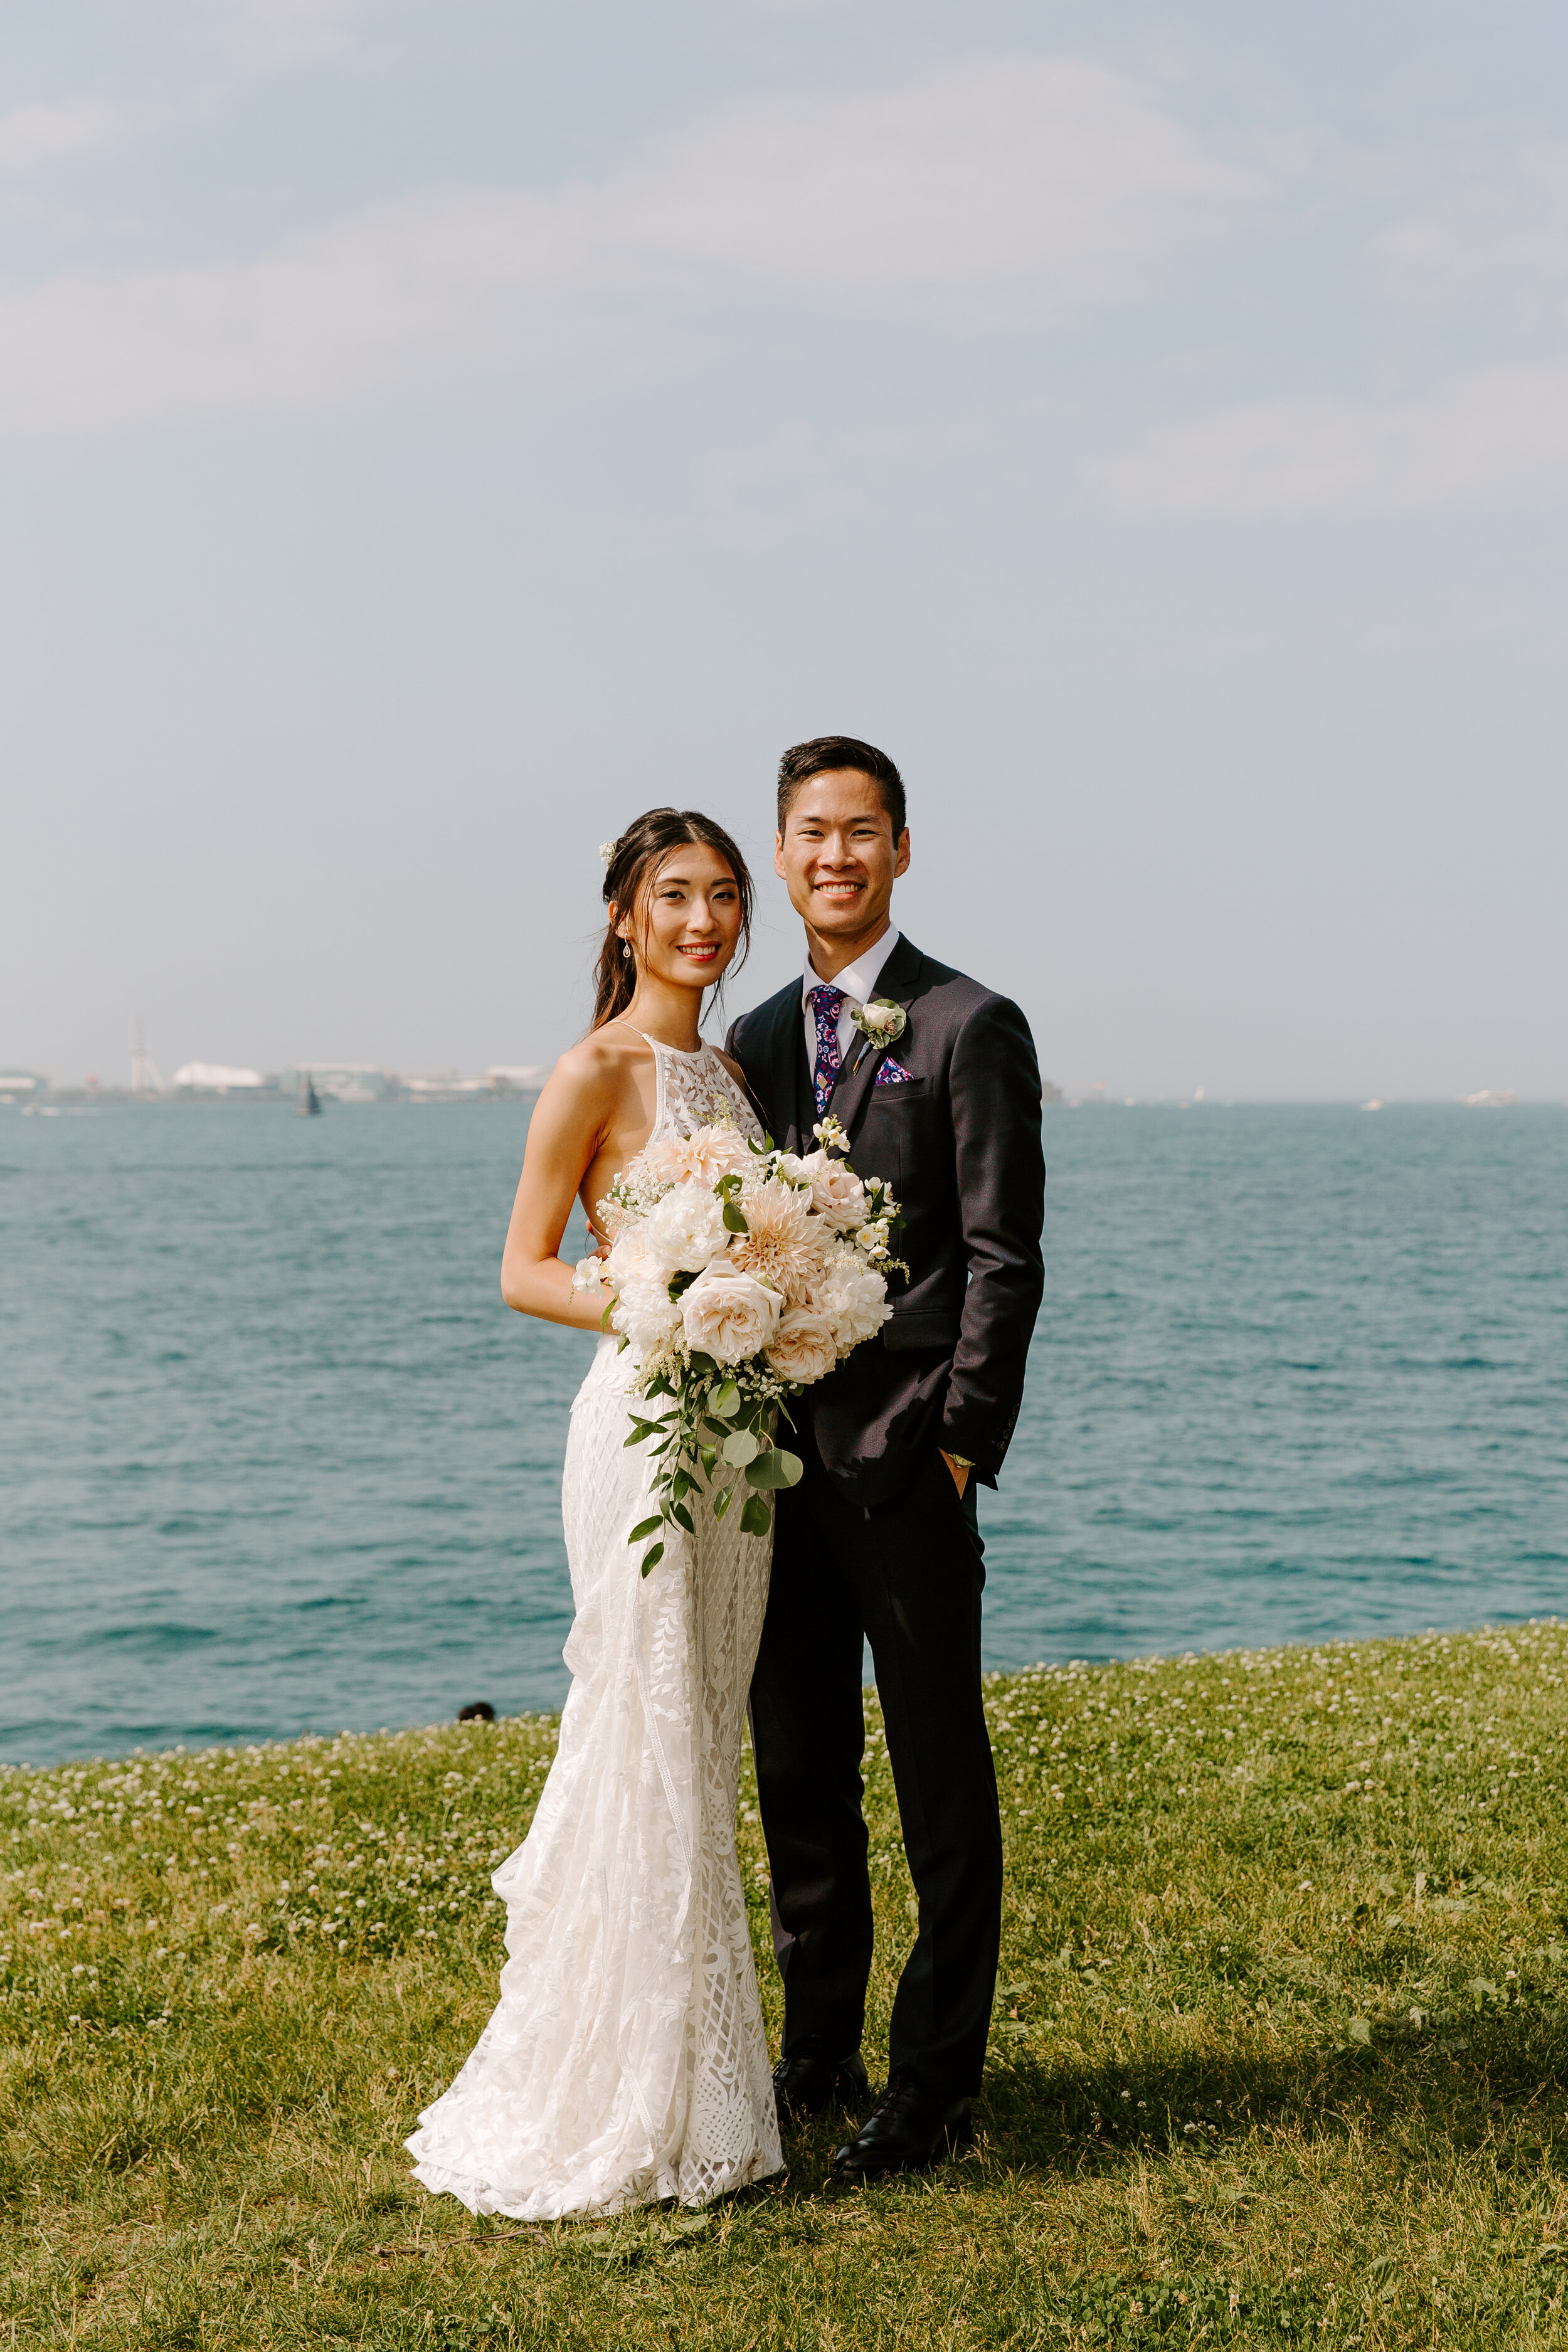 quan wedding-169.jpg